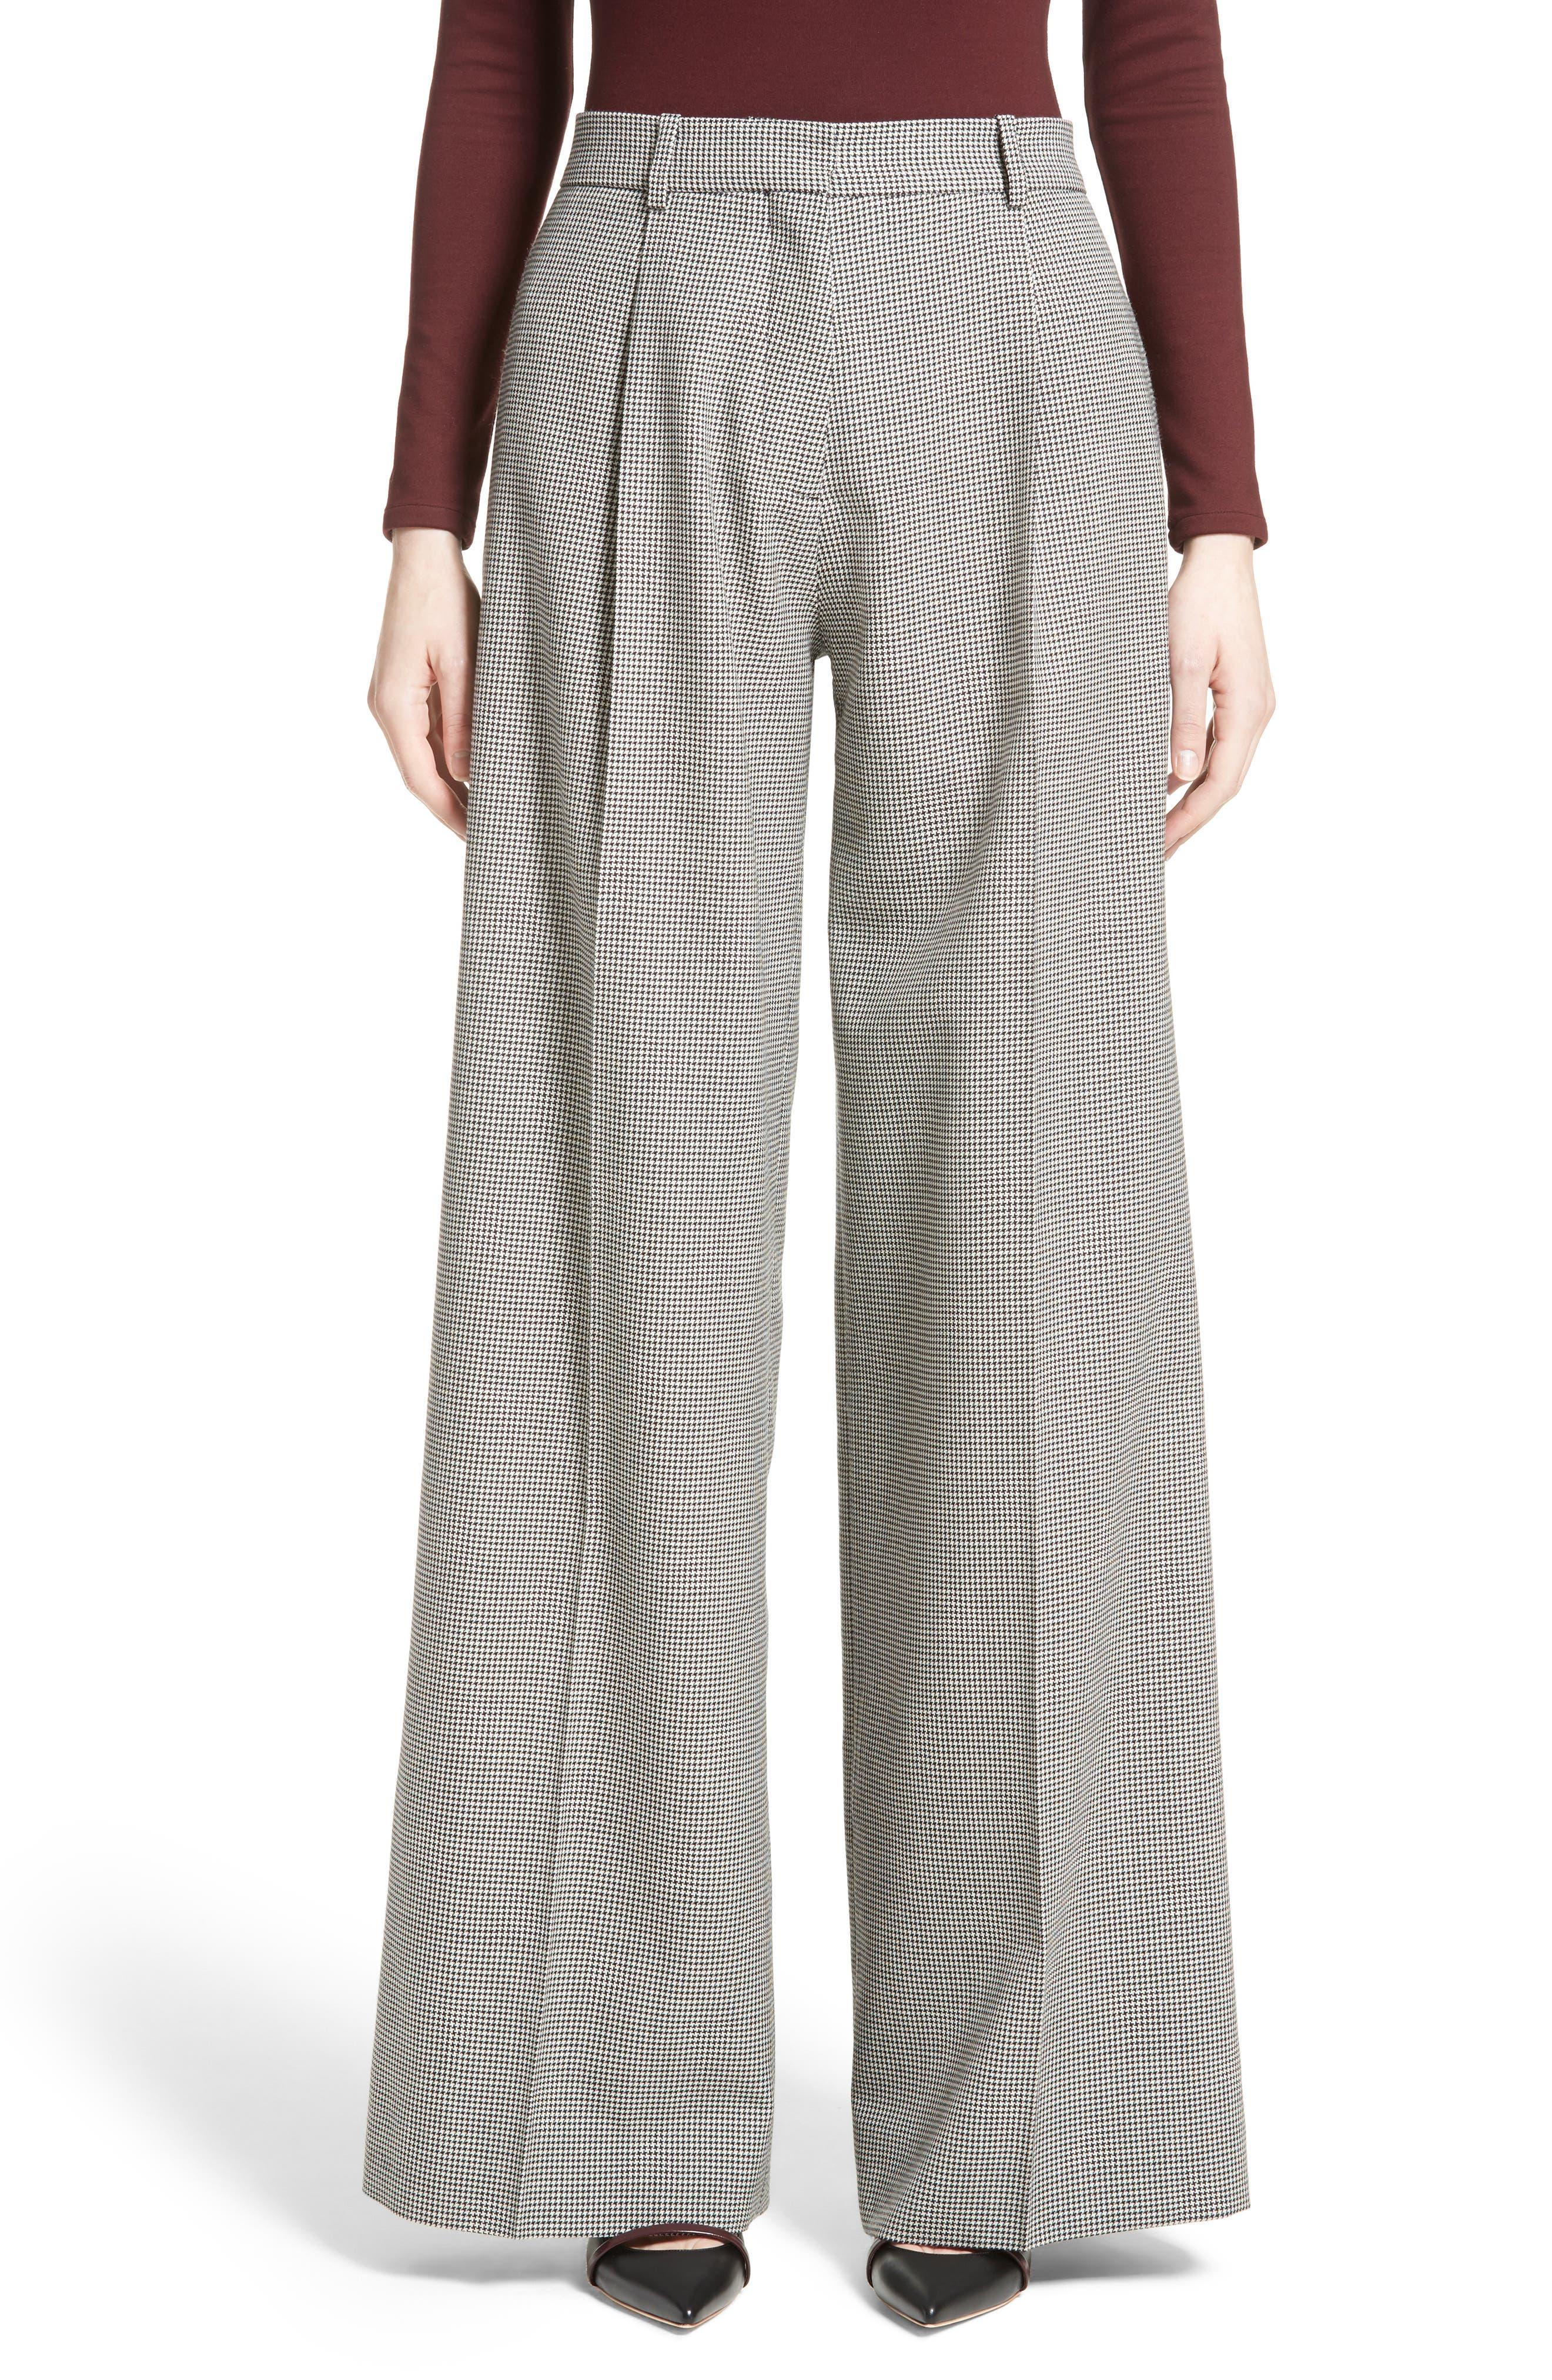 Victoria Beckham Houndstooth Wool Wide Leg Pants